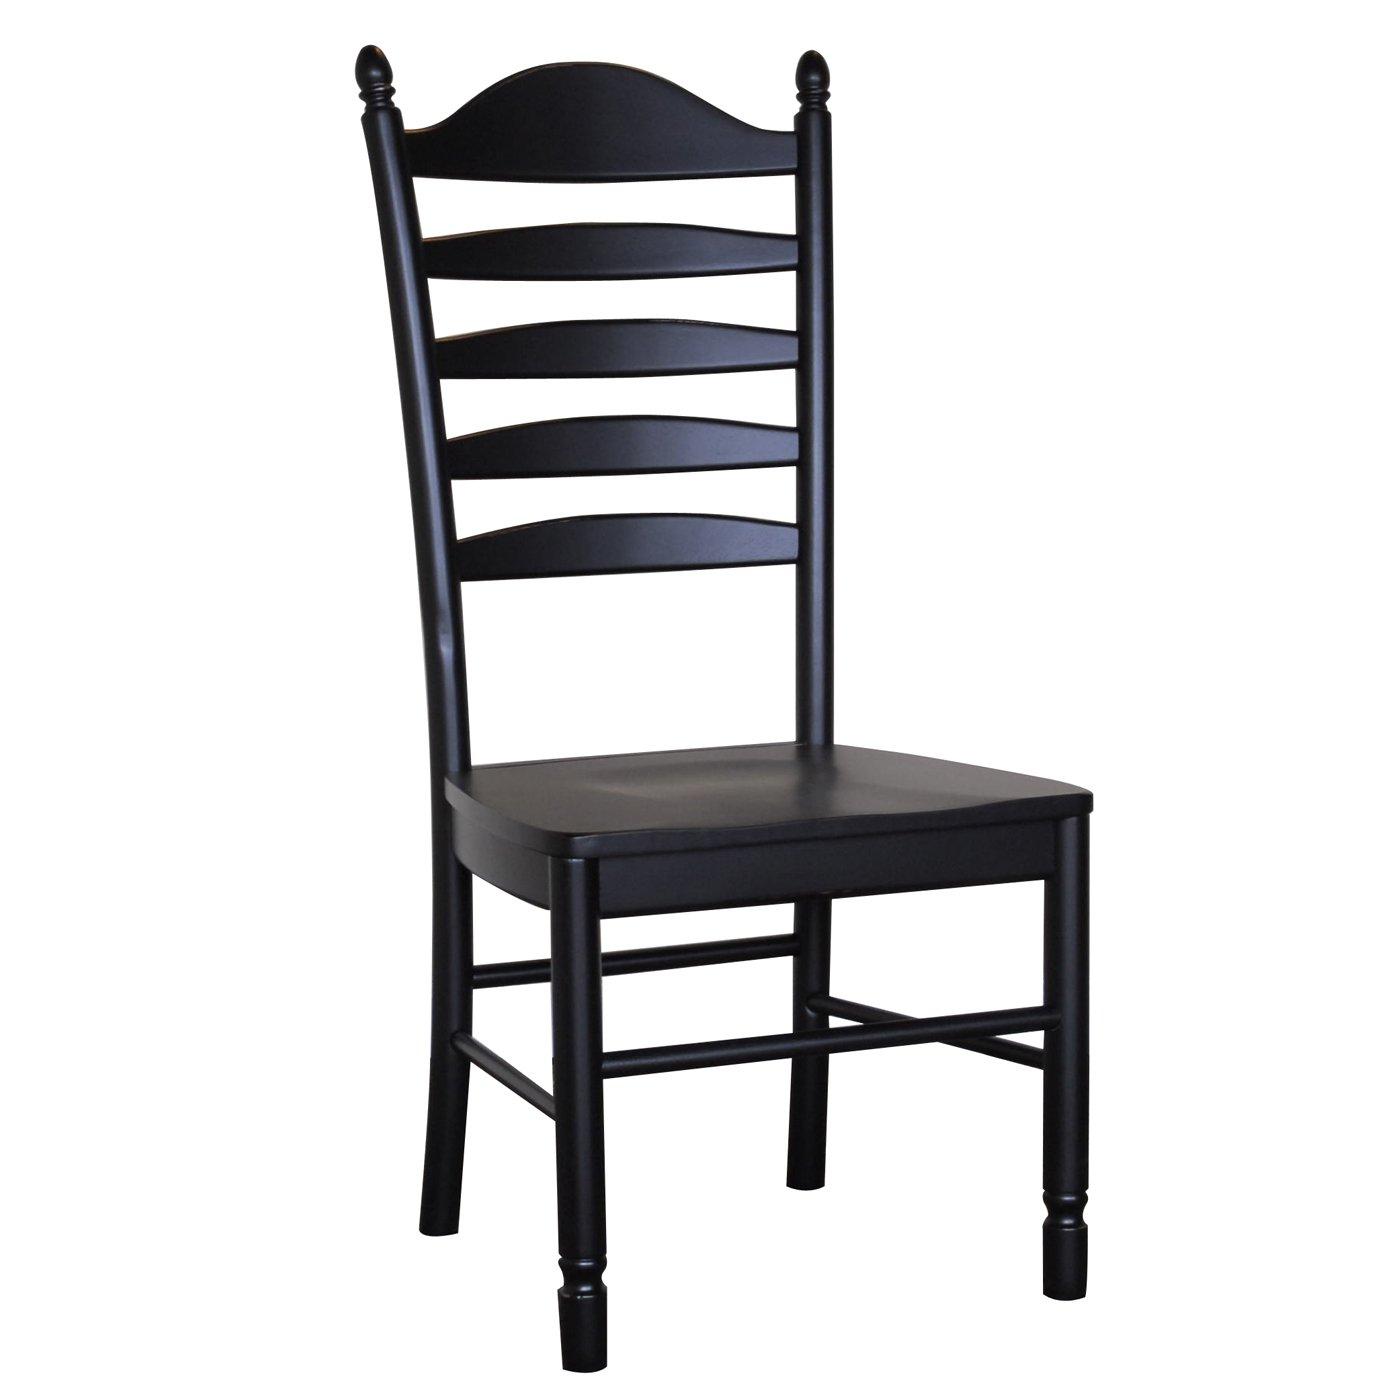 Amazon.com - Carolina Classic Whitman Dining Chair, Antique Black - Chairs - Amazon.com - Carolina Classic Whitman Dining Chair, Antique Black